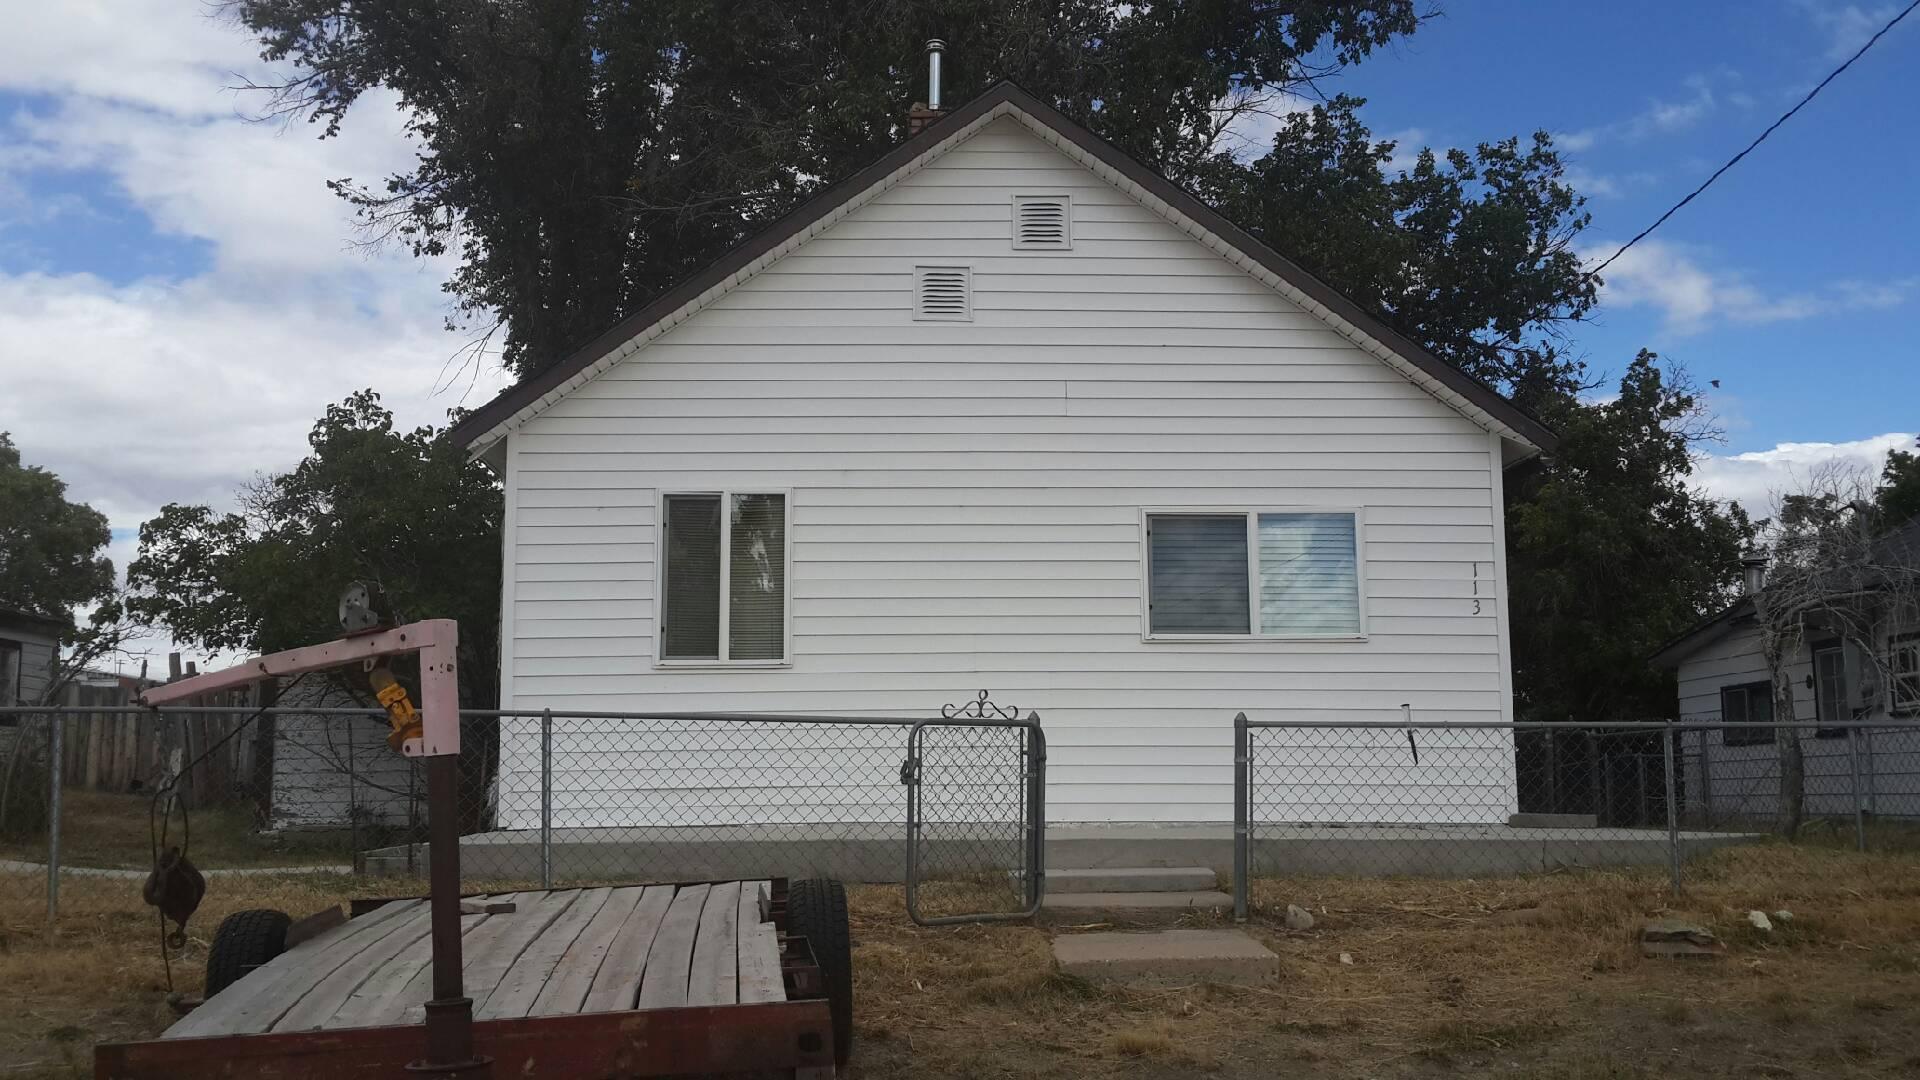 113 N. Harrison, Hanna, Wyoming 82327